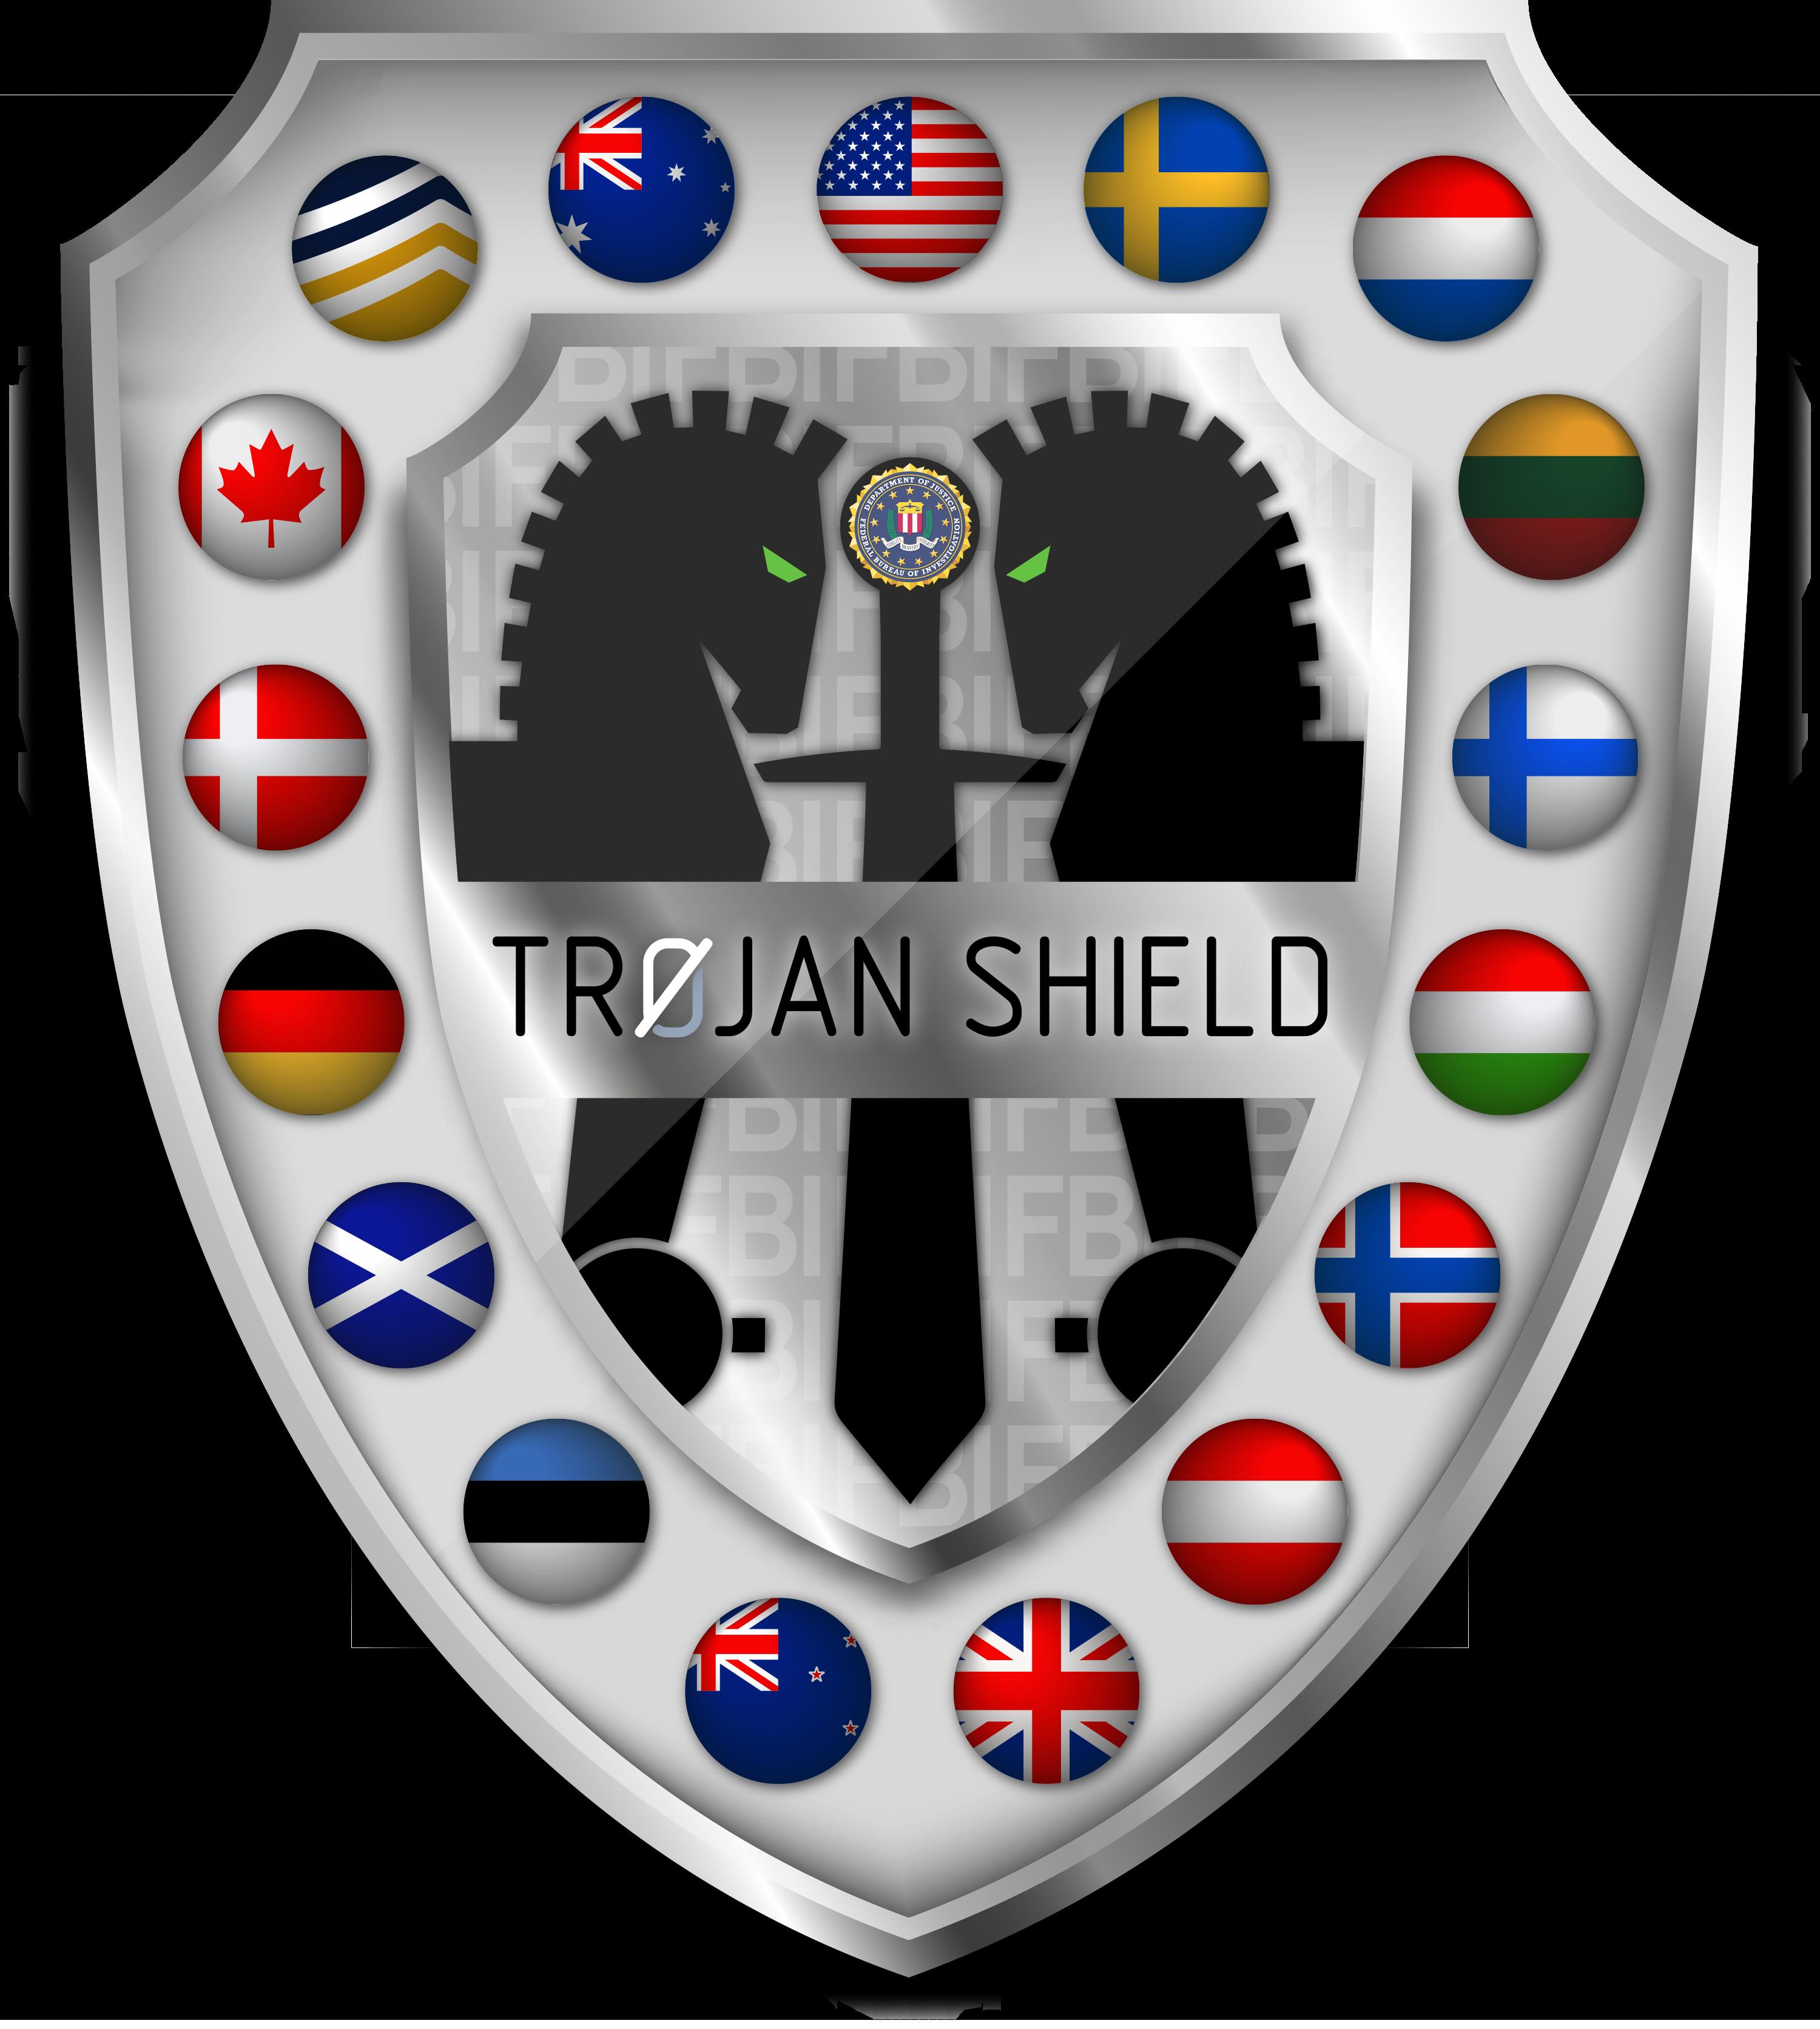 https://www.fbi.gov/image-repository/sdo-op-trojan-shield-seal.png